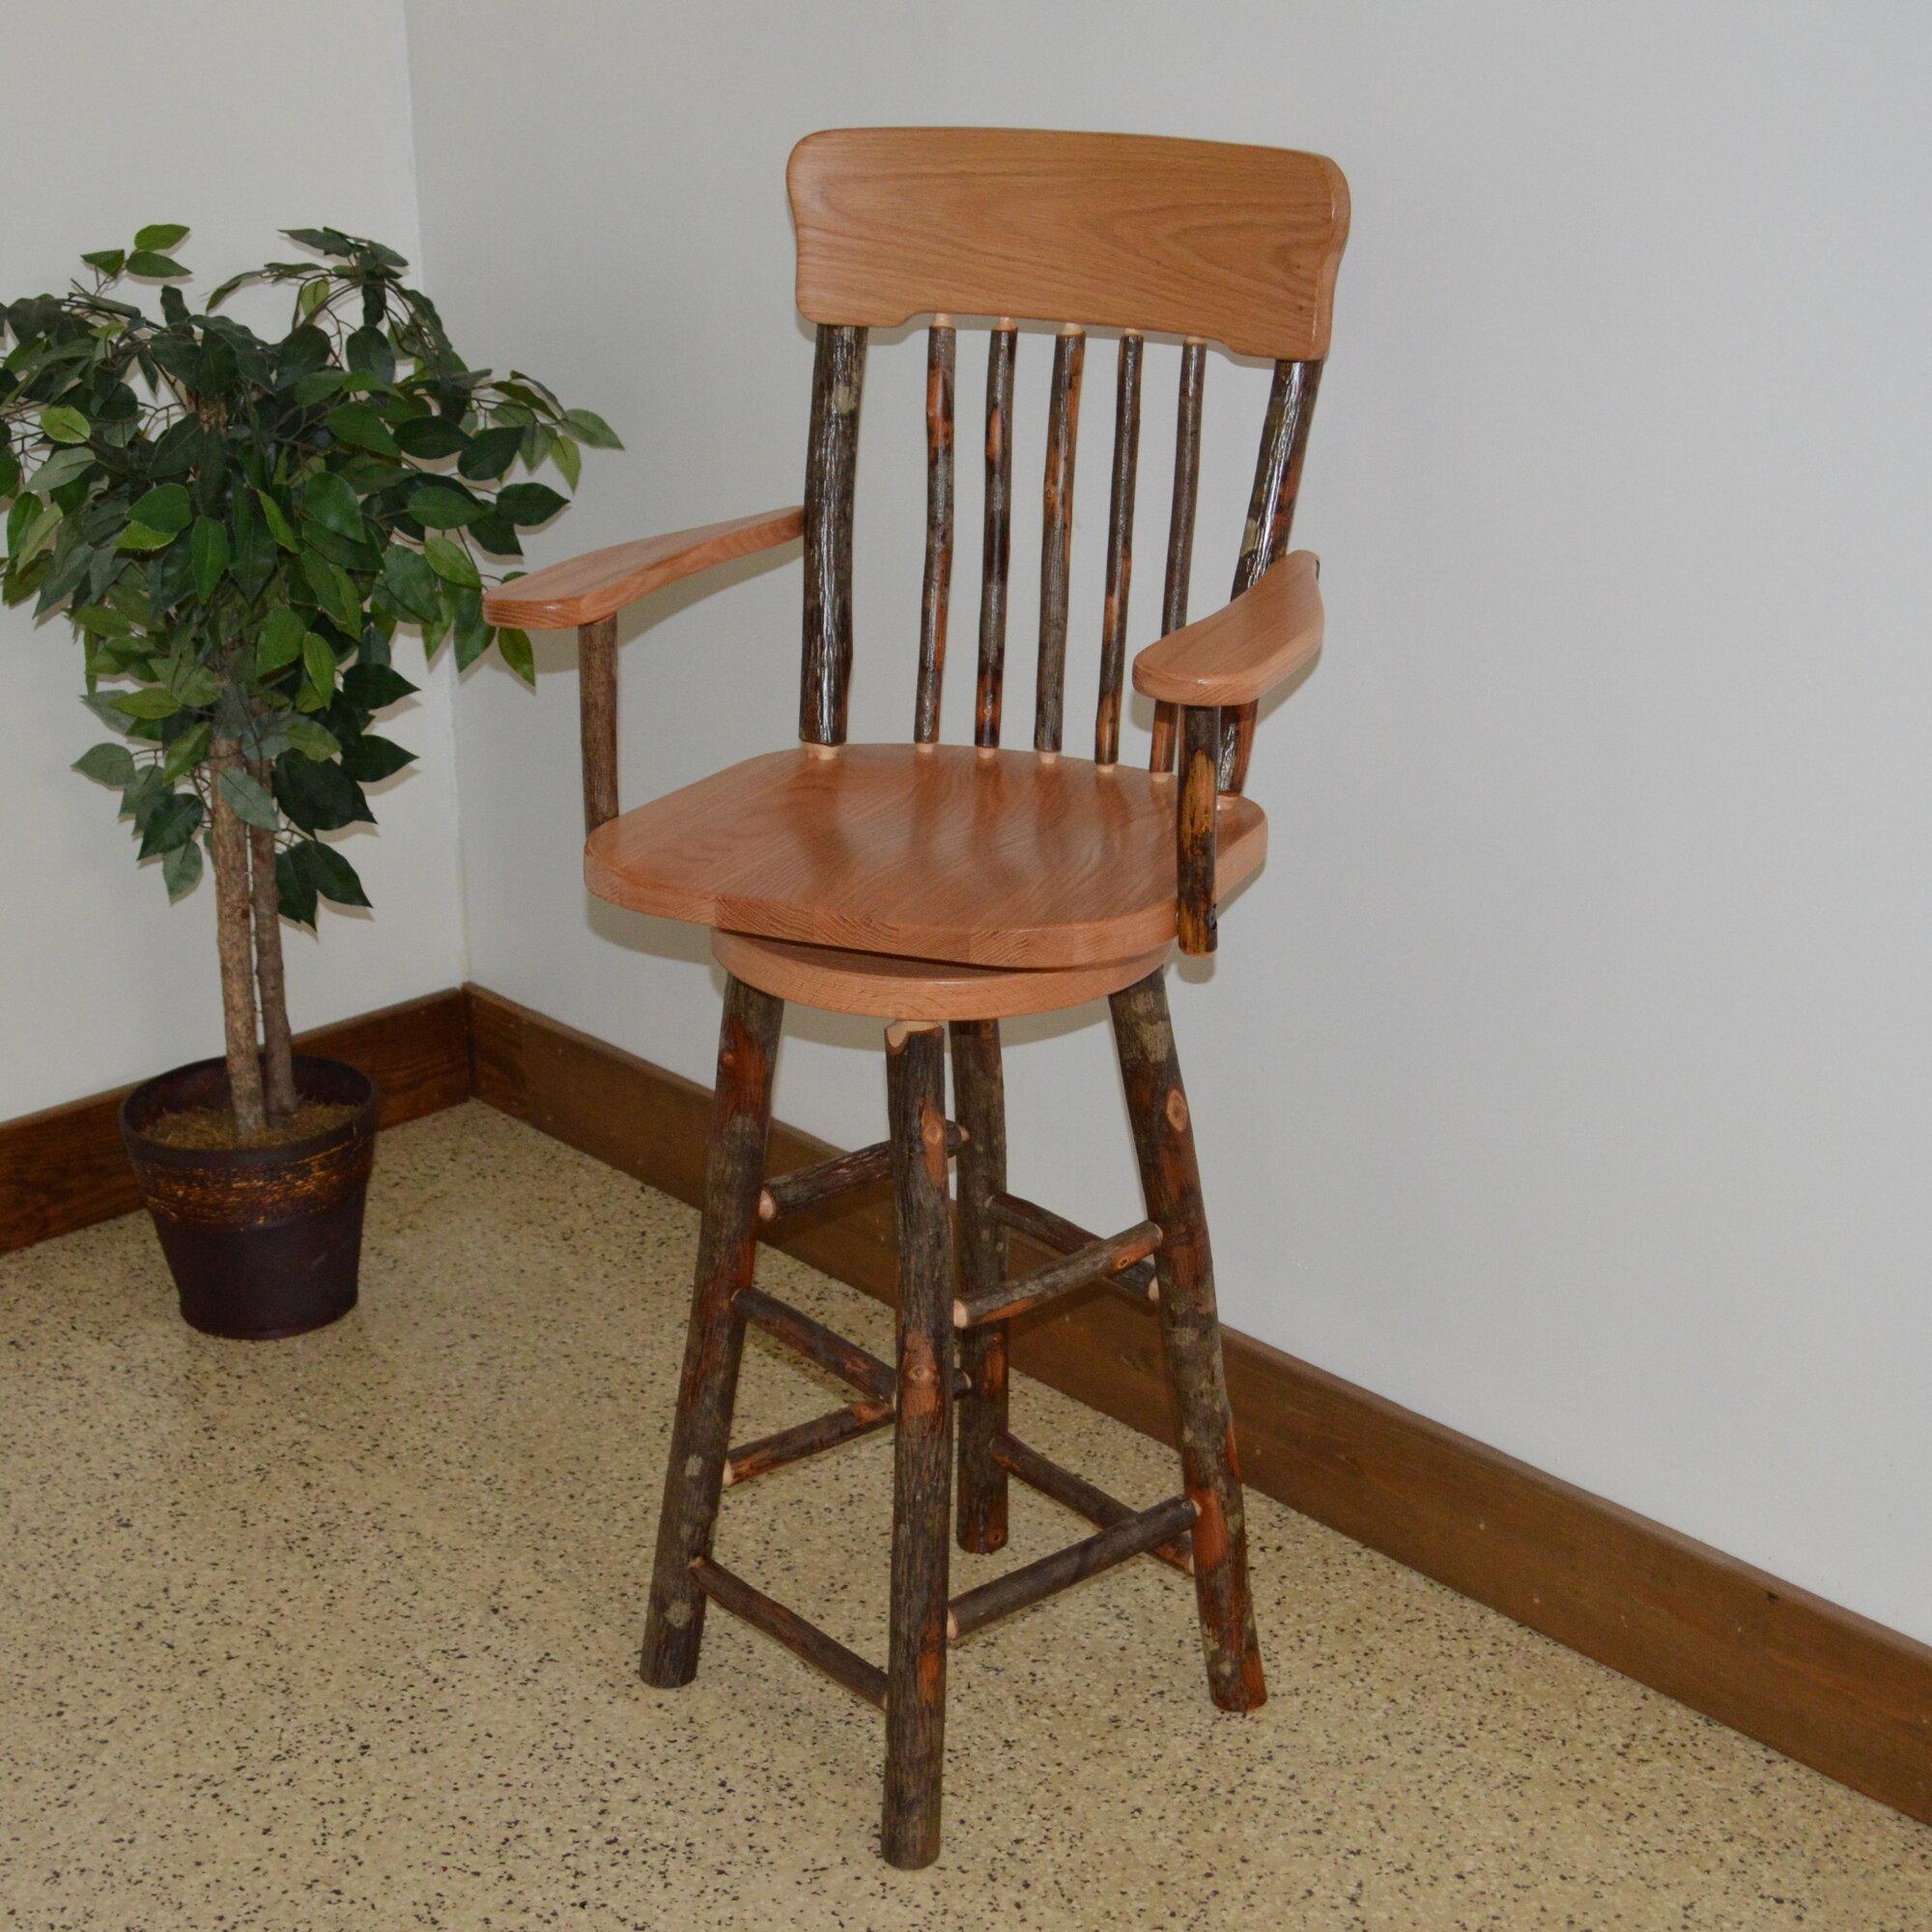 A L Furniture Hickory 29 Swivel Bar Stool EBay